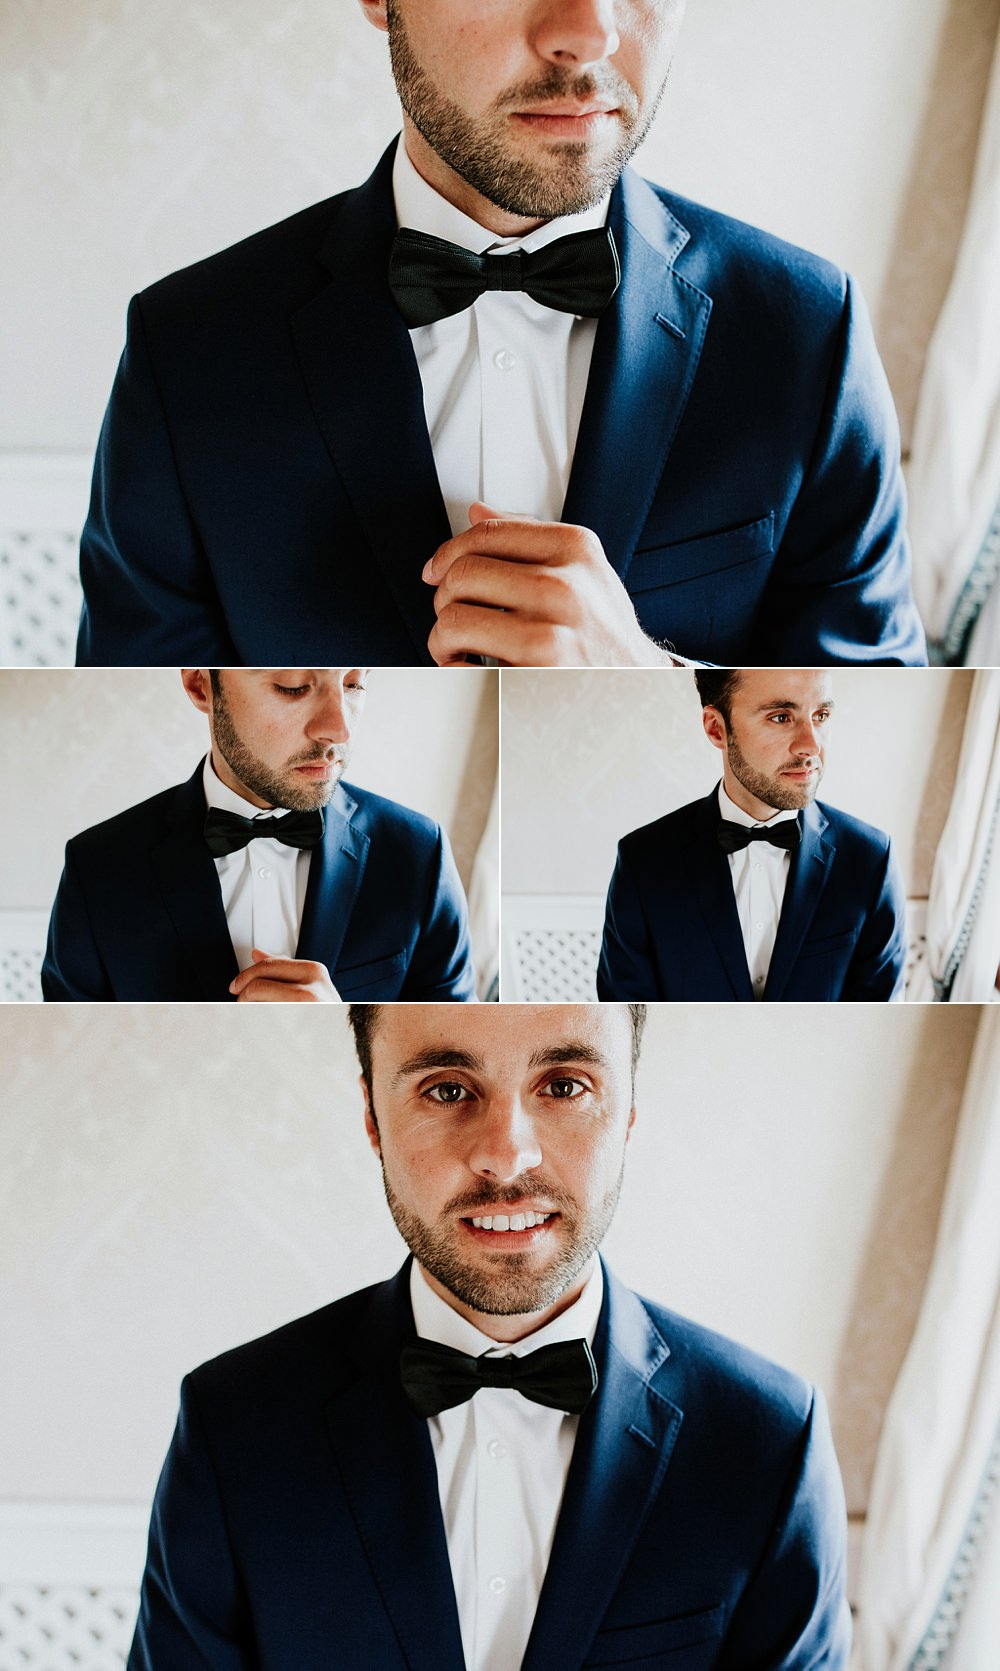 fotografo-matrimonio-same-sex-venezia 0032